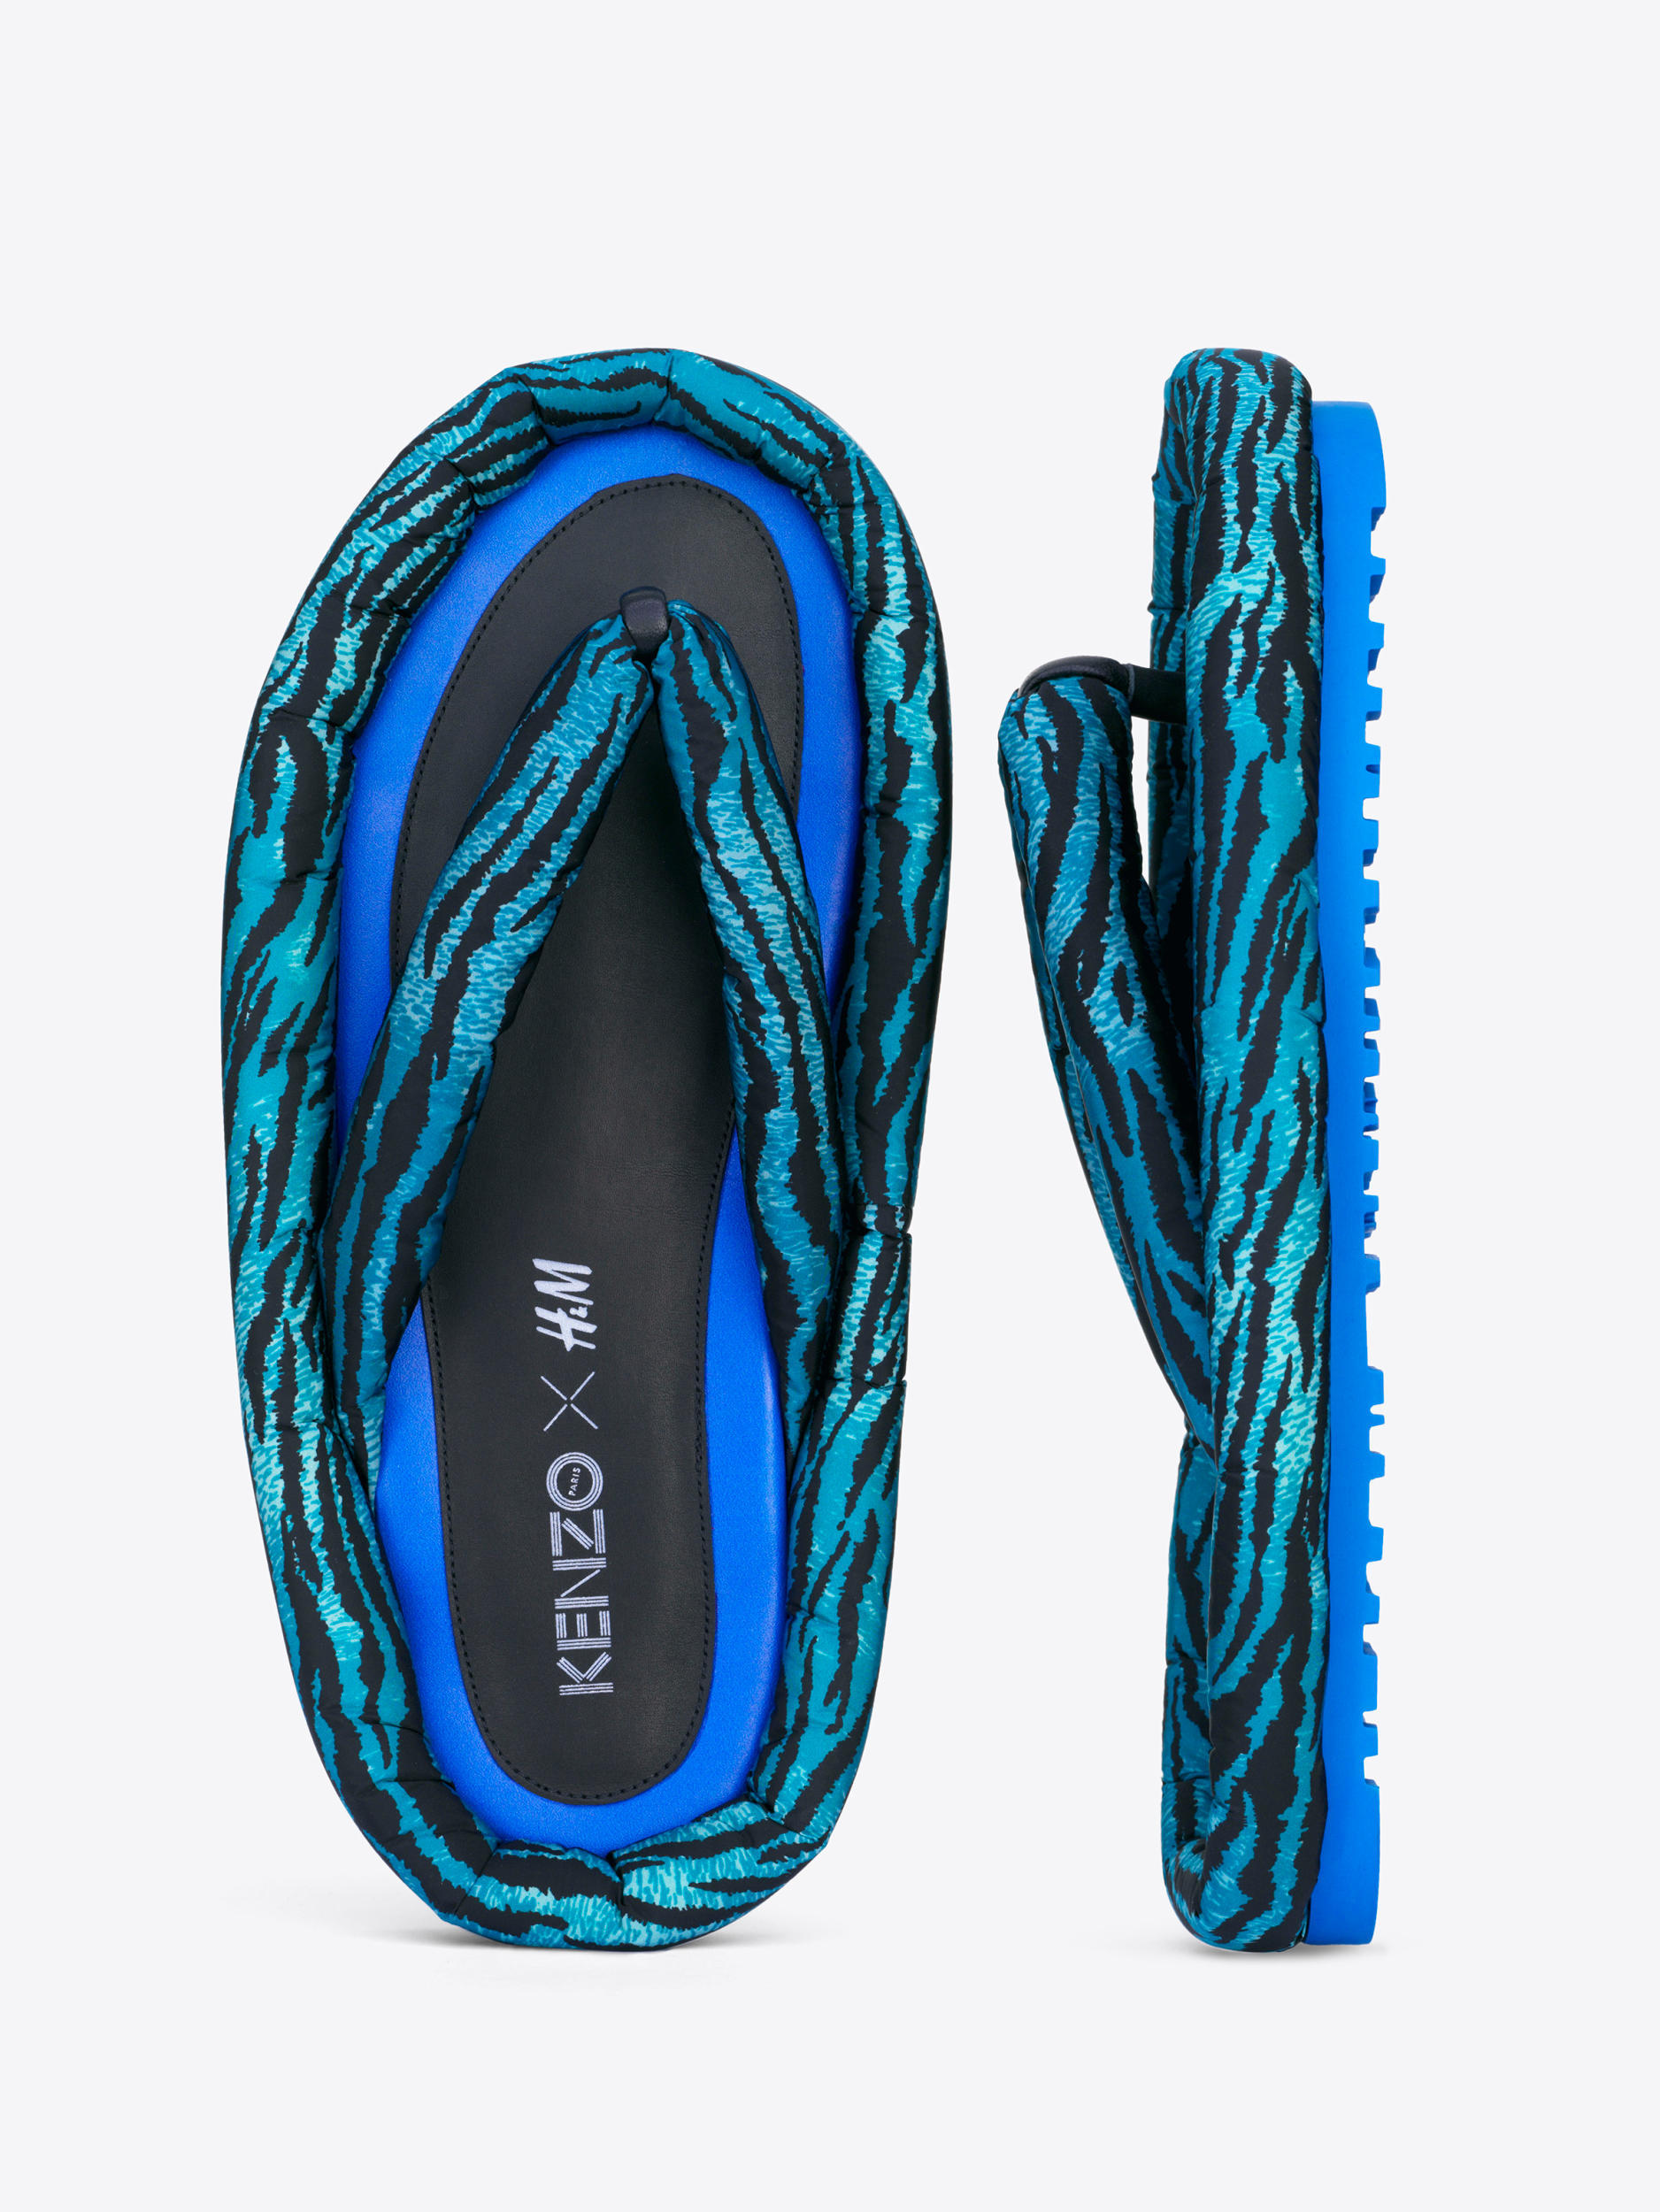 KENZO X H&M sandals.jpg